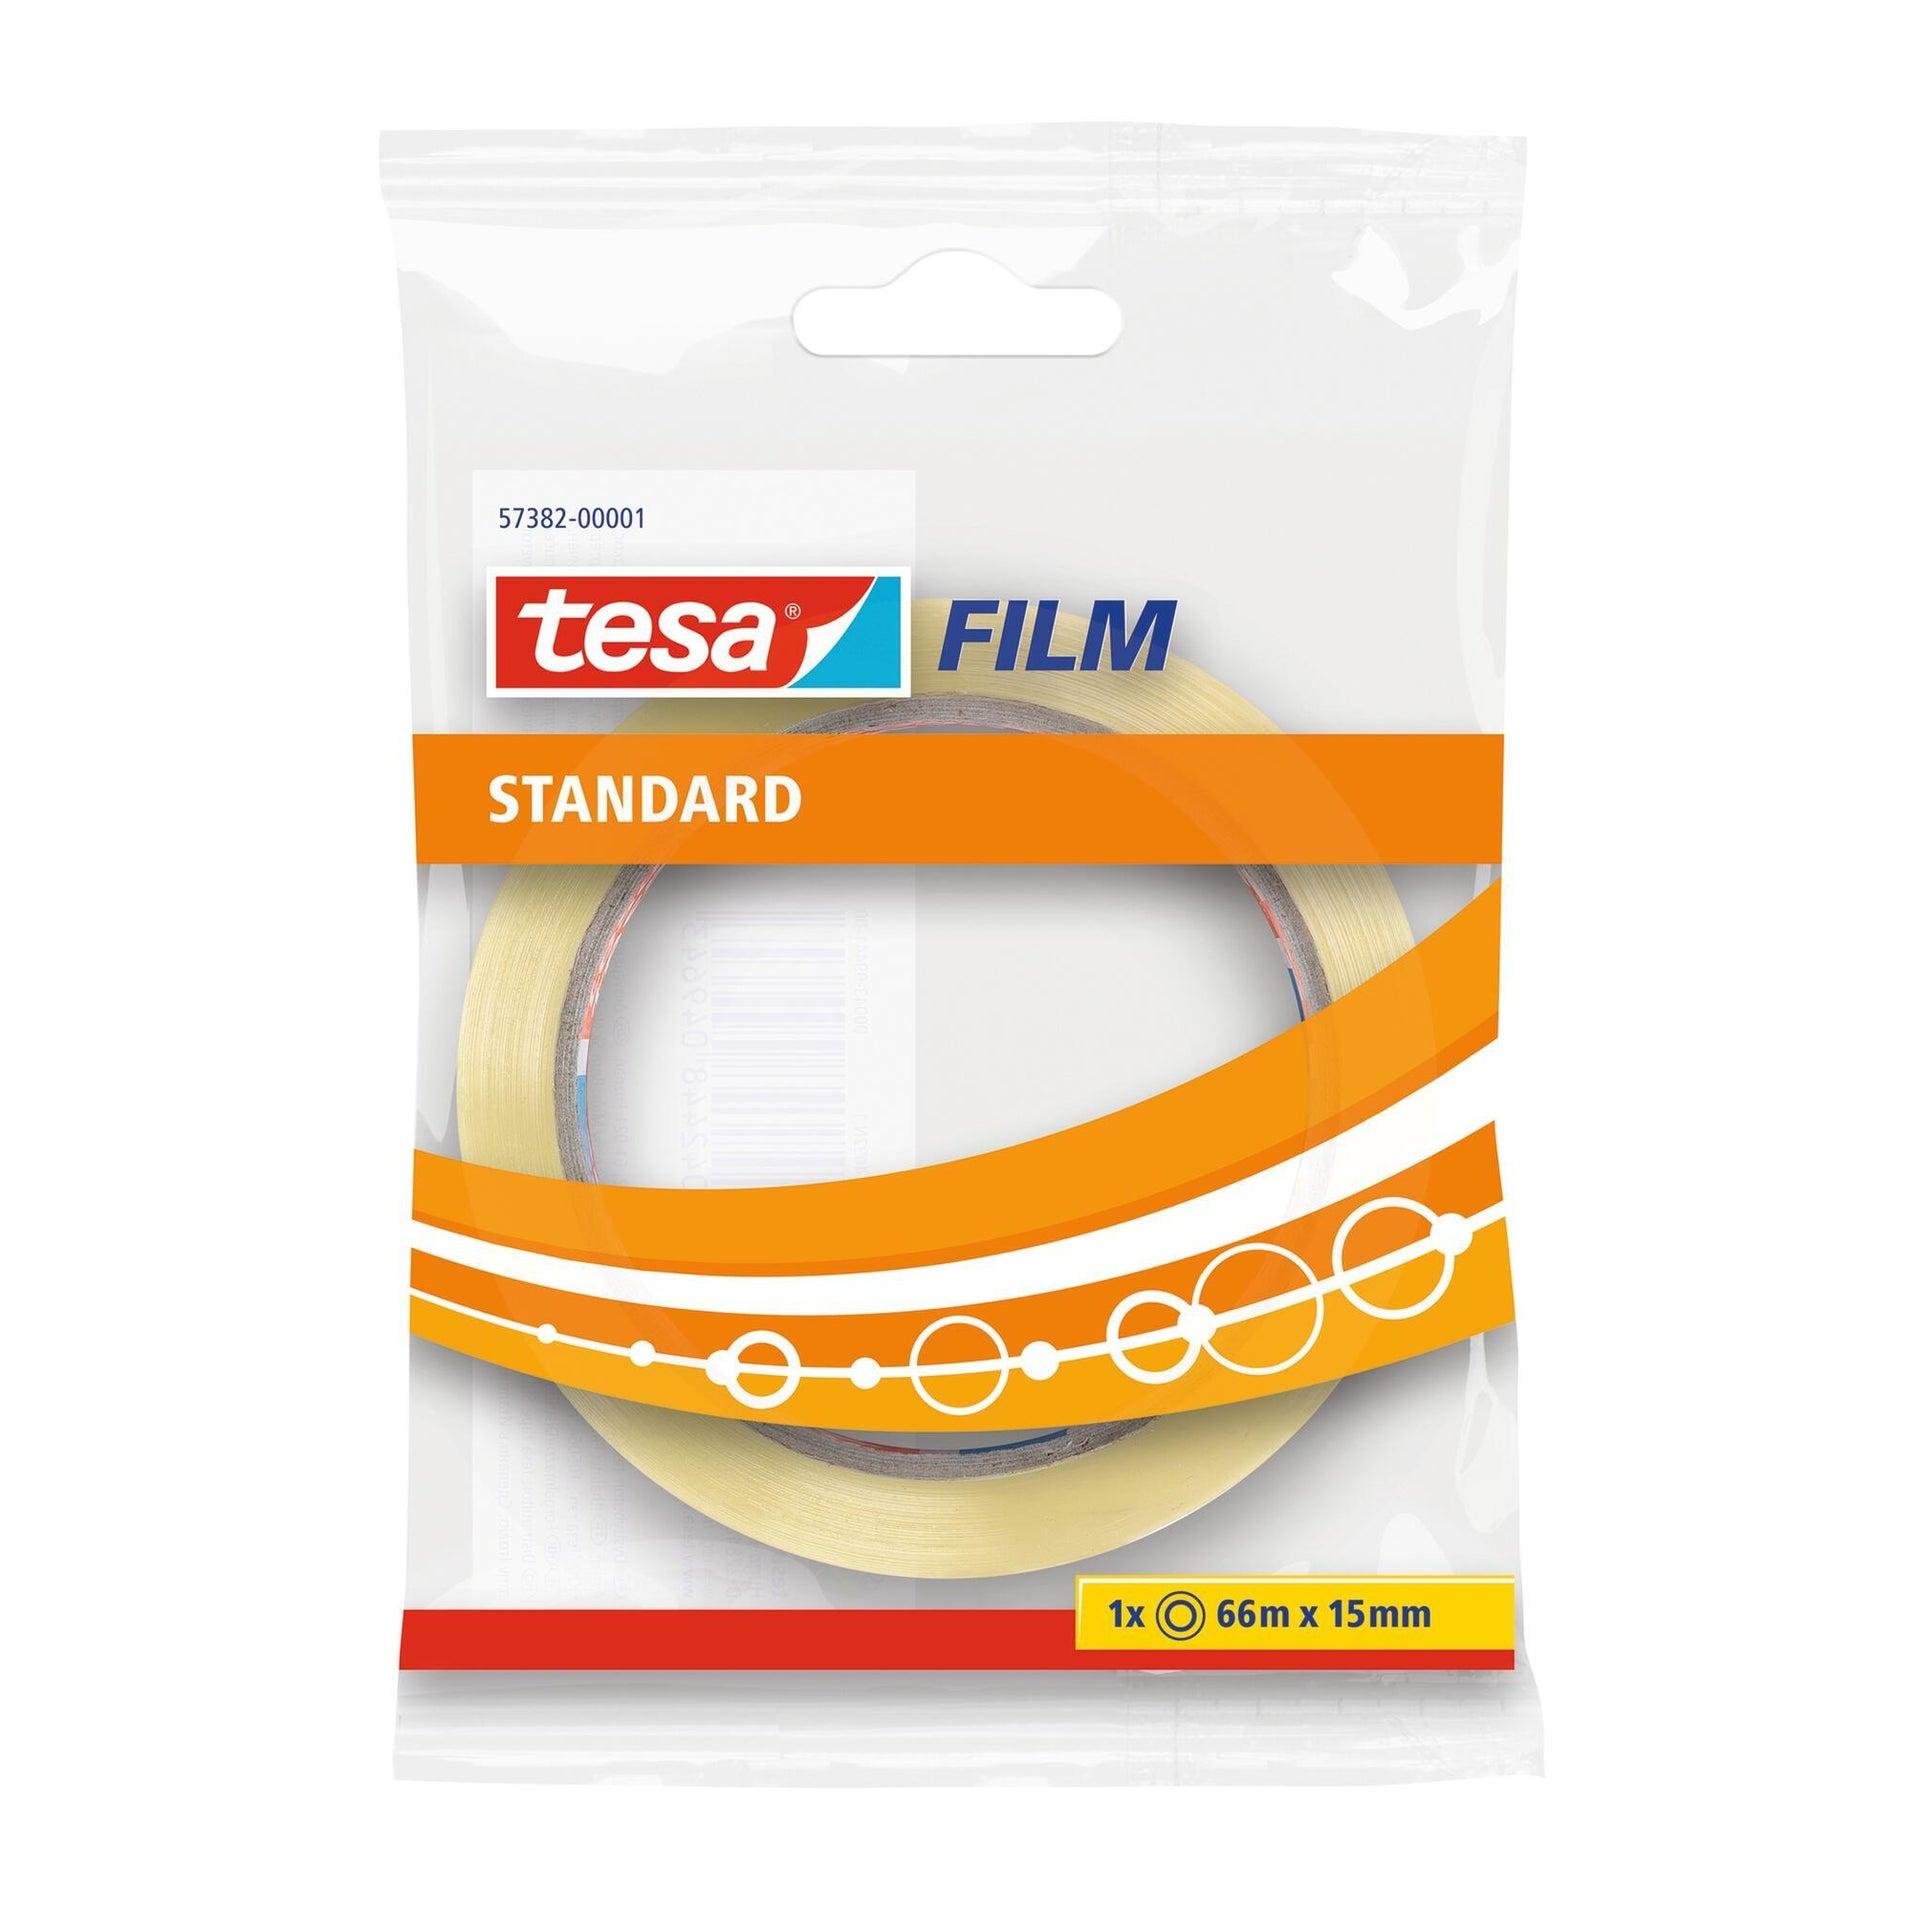 Nastro adesivo TESA tesafilm 15 mm x 66 m trasparente - 8